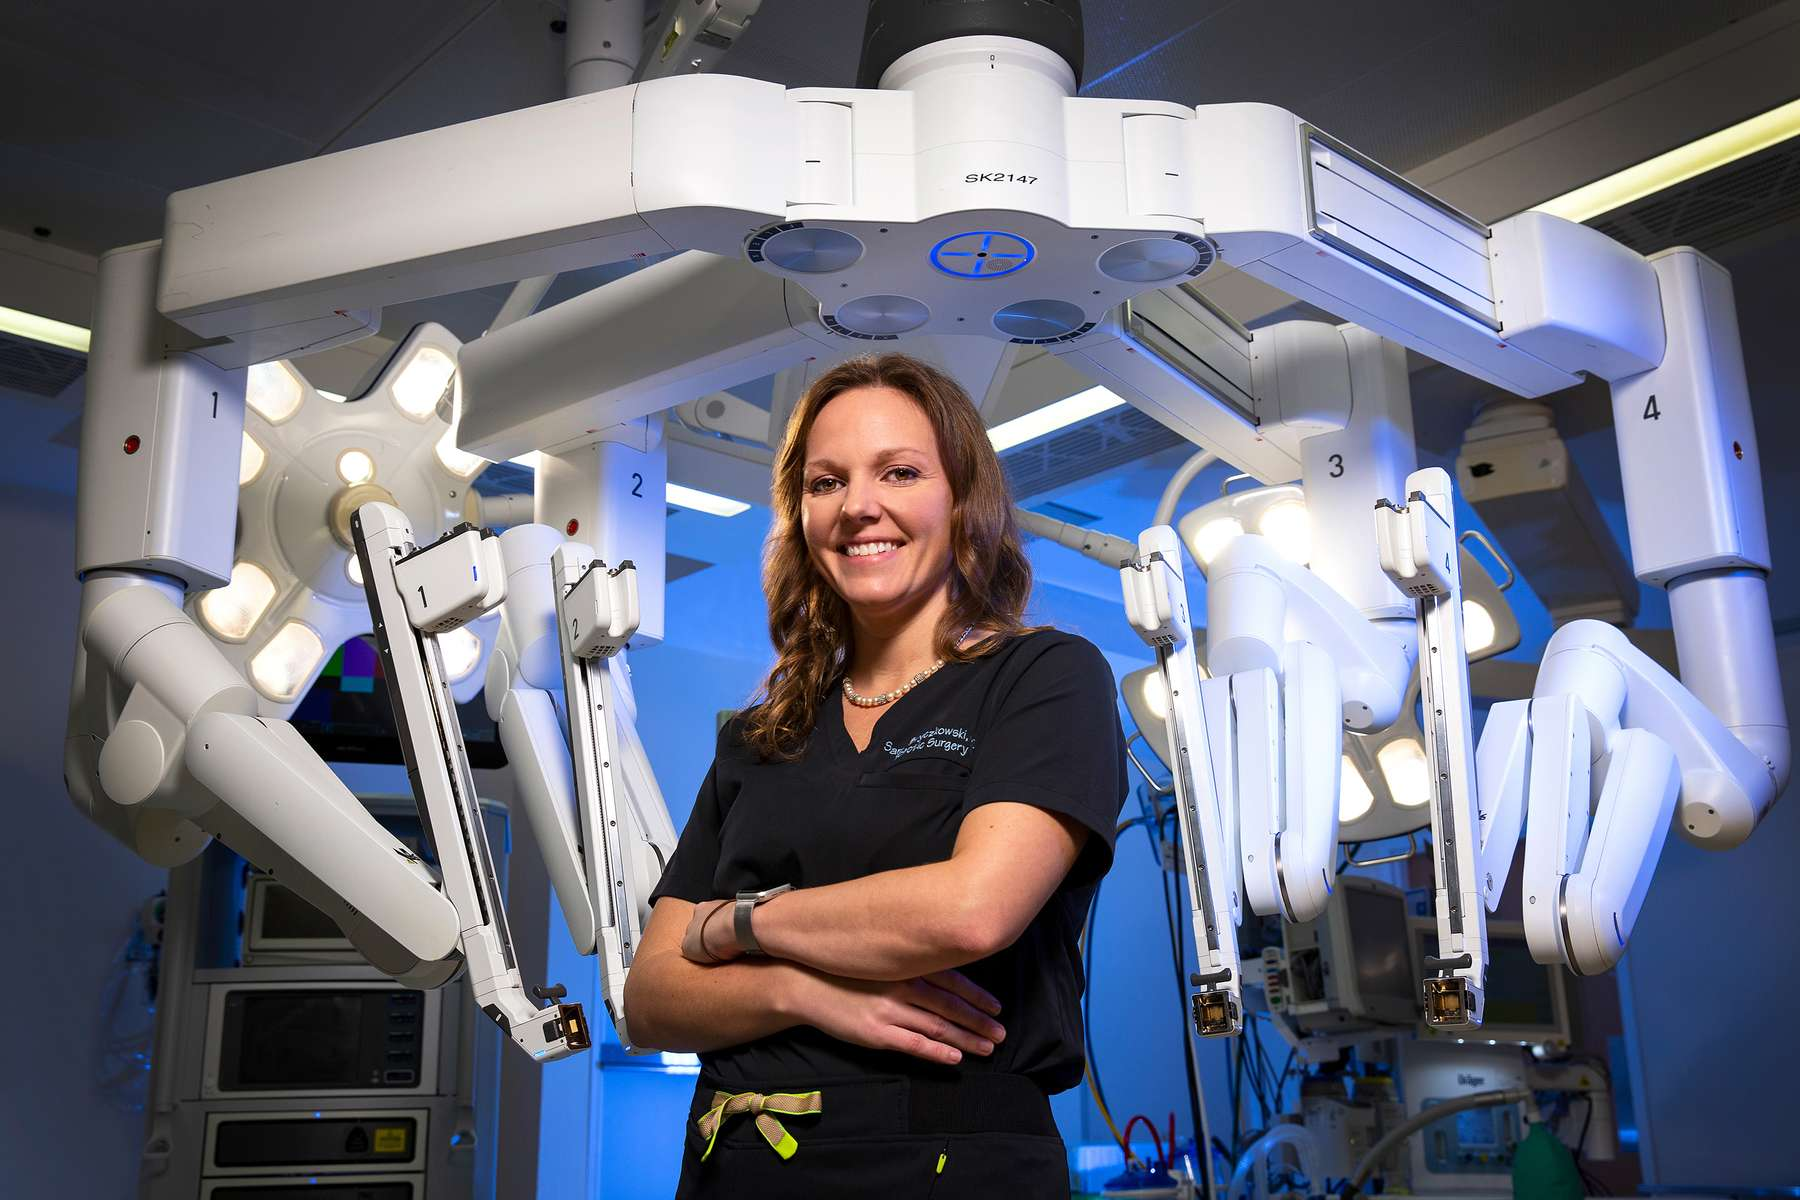 JFK Medical Center Robotic Surgeons